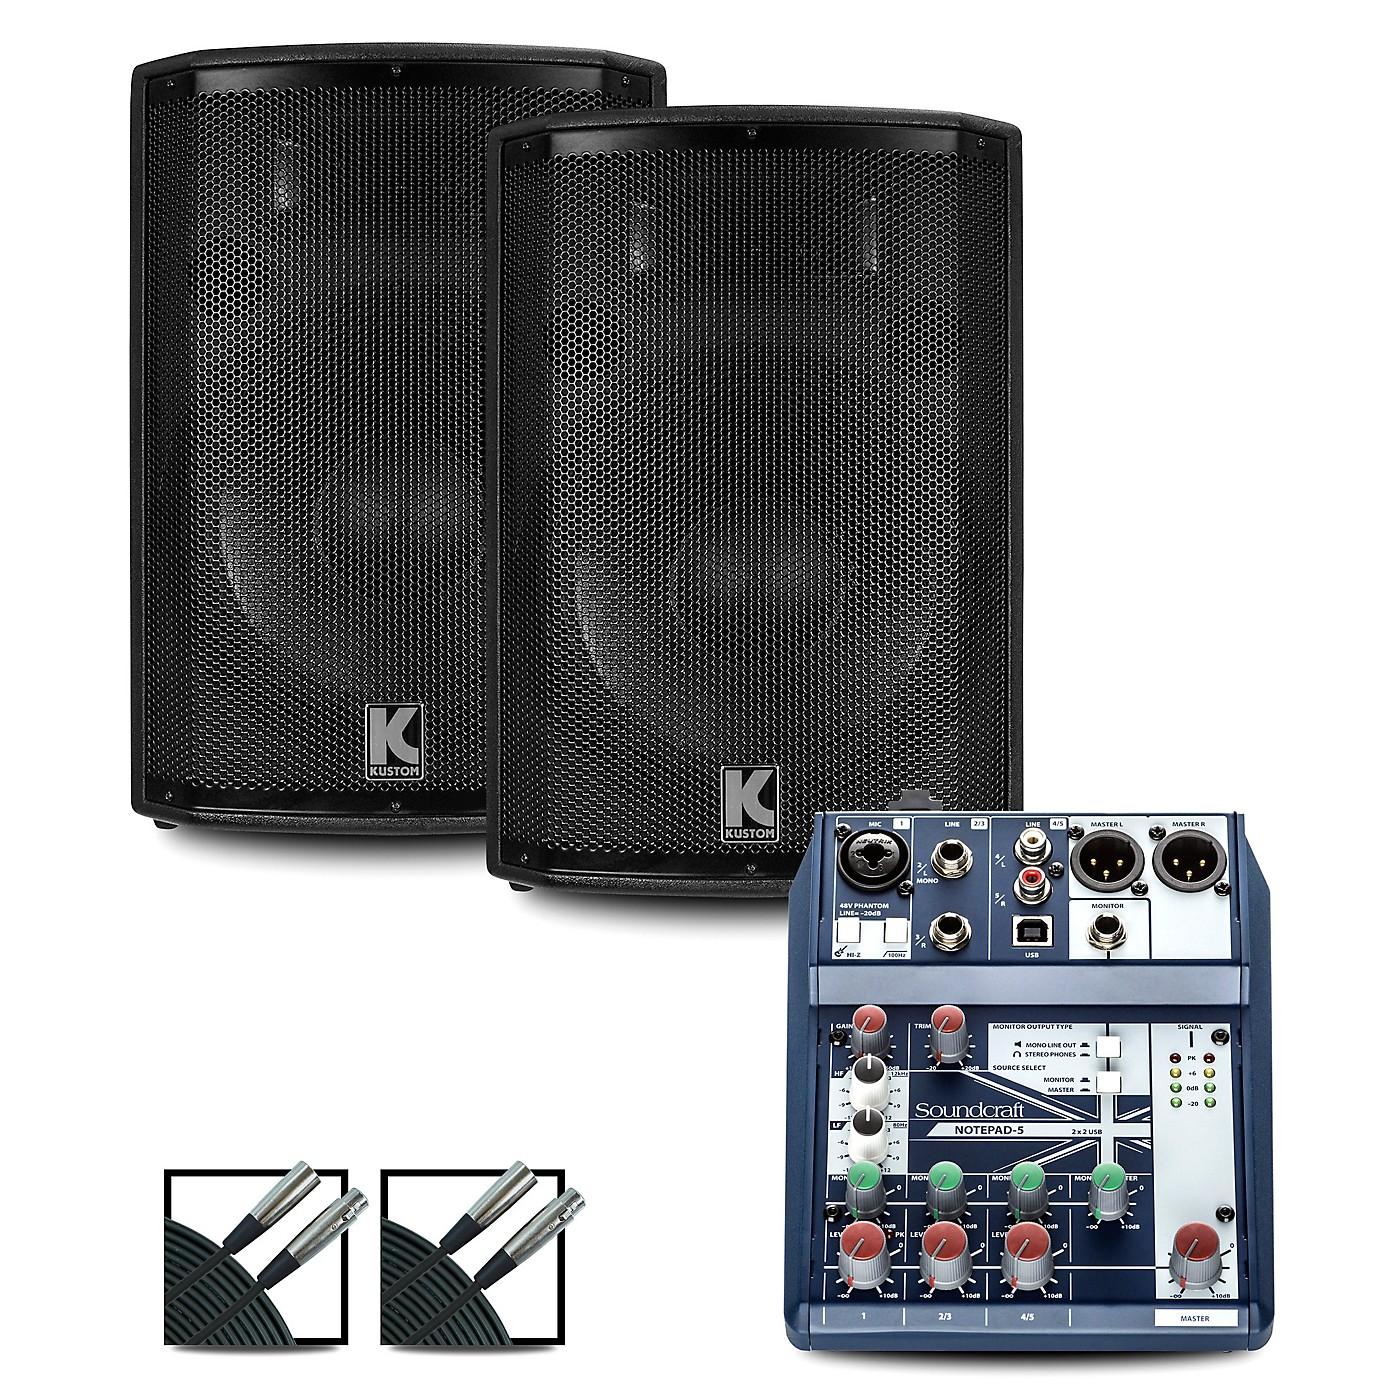 Soundcraft Notepad12FX Mixer and Kustom HiPAC Speakers thumbnail